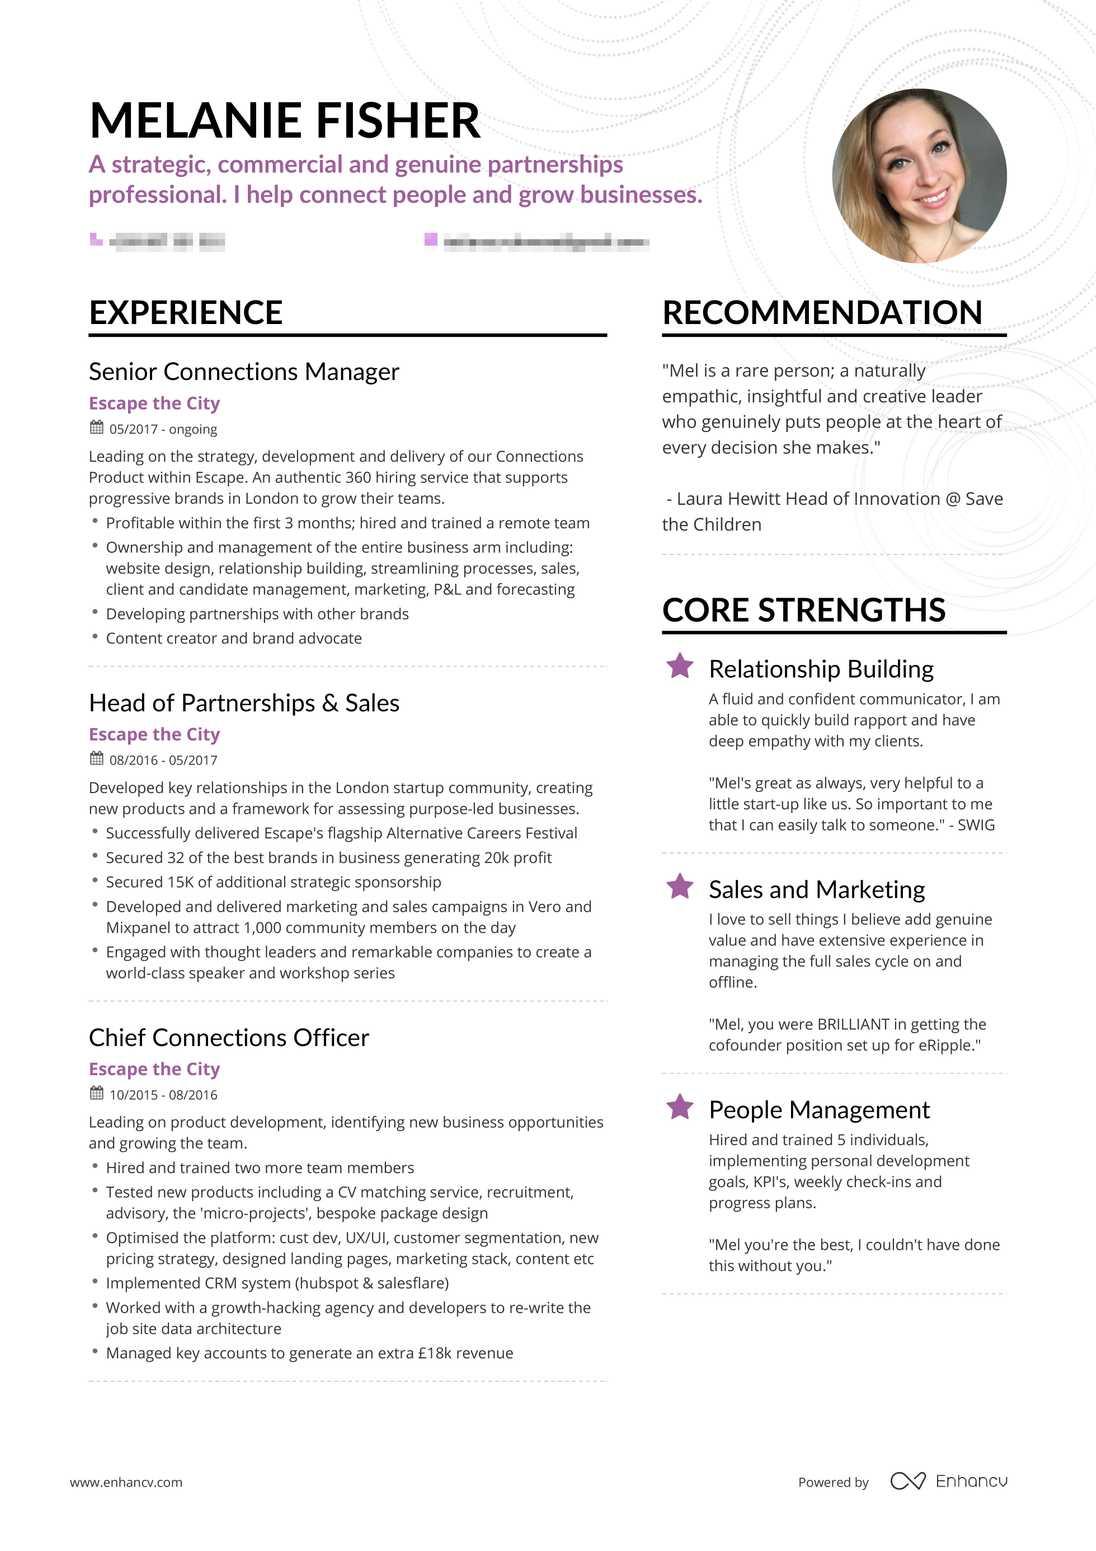 Real Sales Resume Example | Enhancv